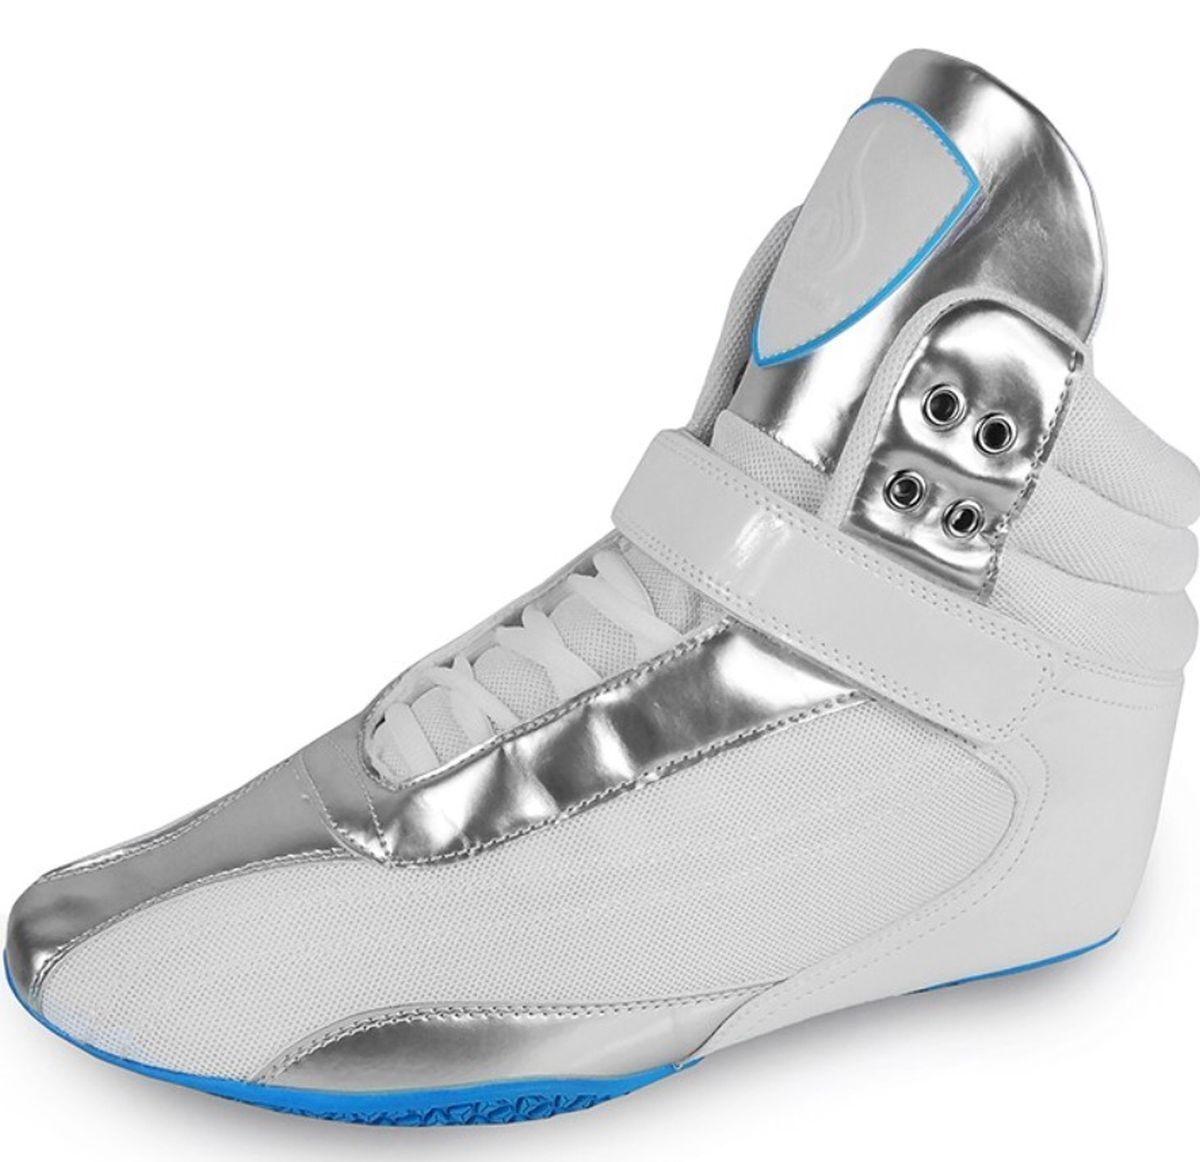 Ryderwear Raptors G-Force Performance Schuhe- Weiß Ice- Neu